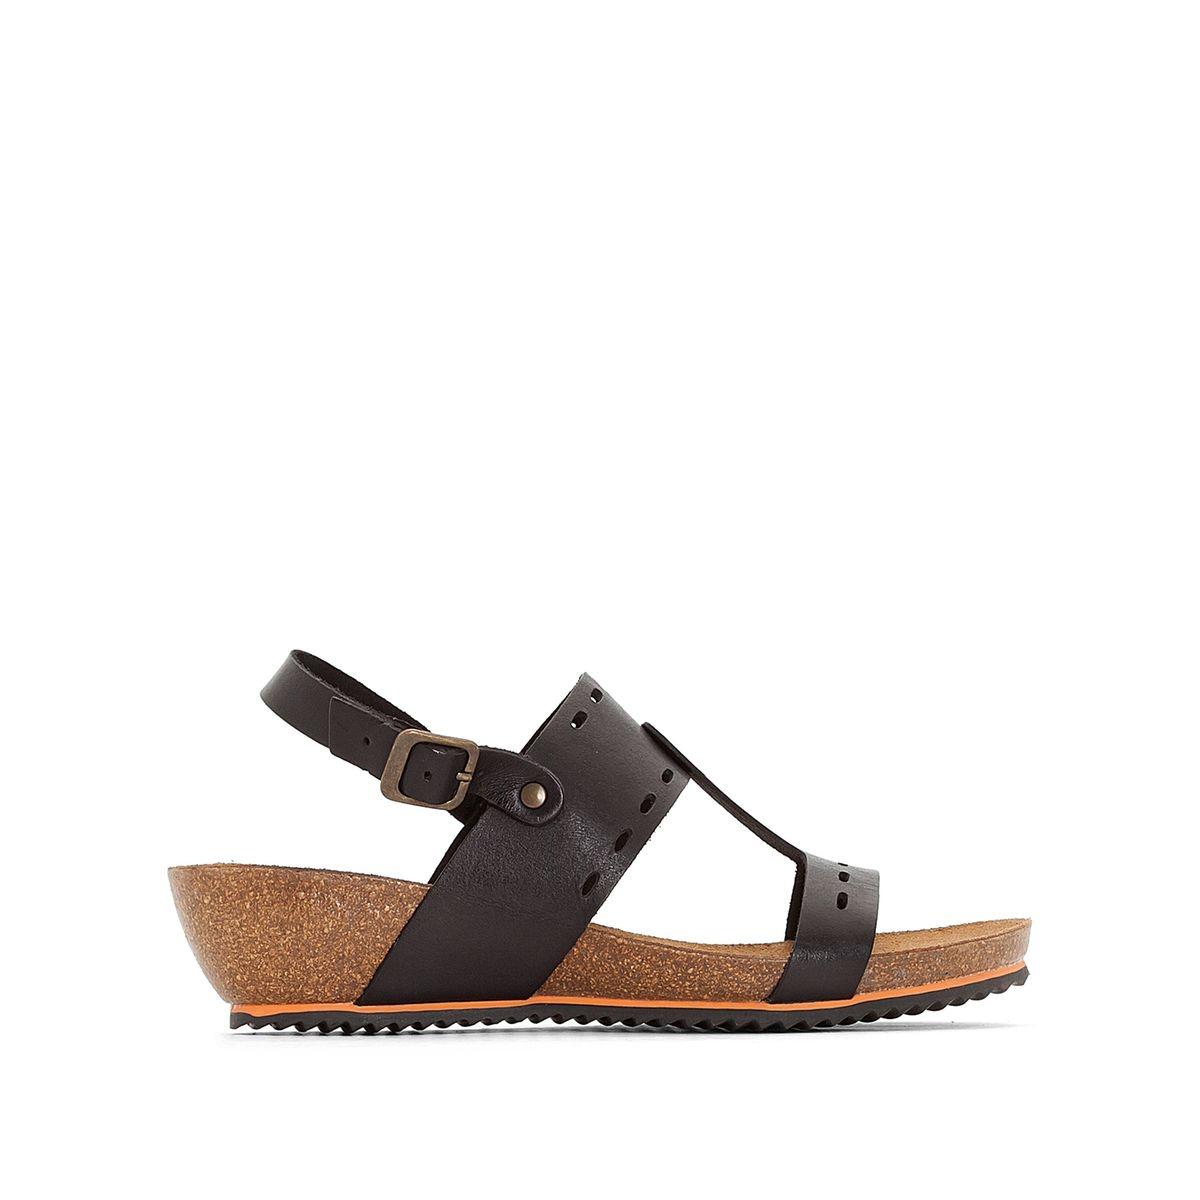 Sandales compensées Tokali